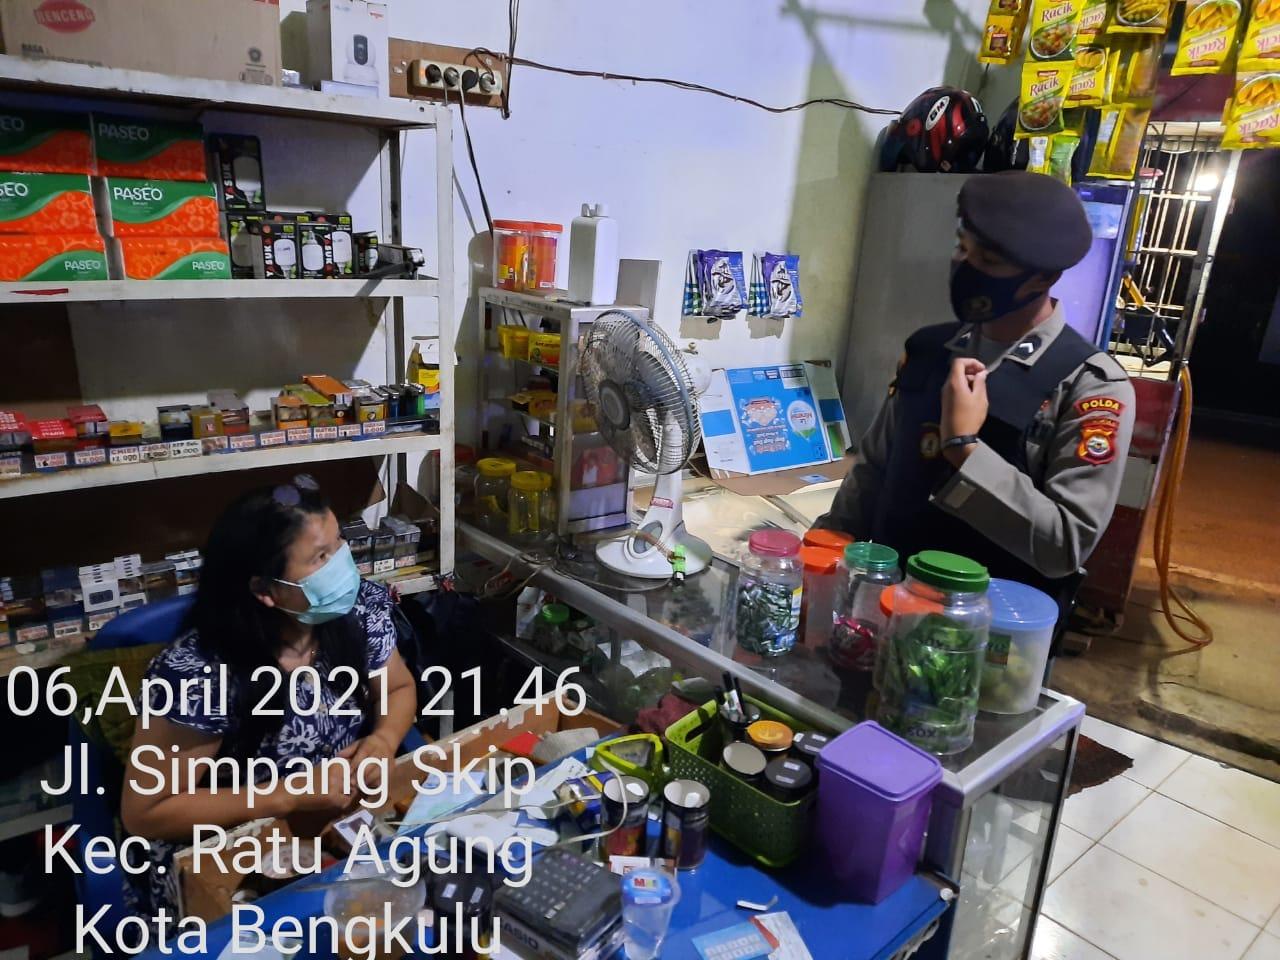 Samapta Polda Bengkulu Patroli Malam Hari Ingatkan Masyarakat Prokes Covid-19